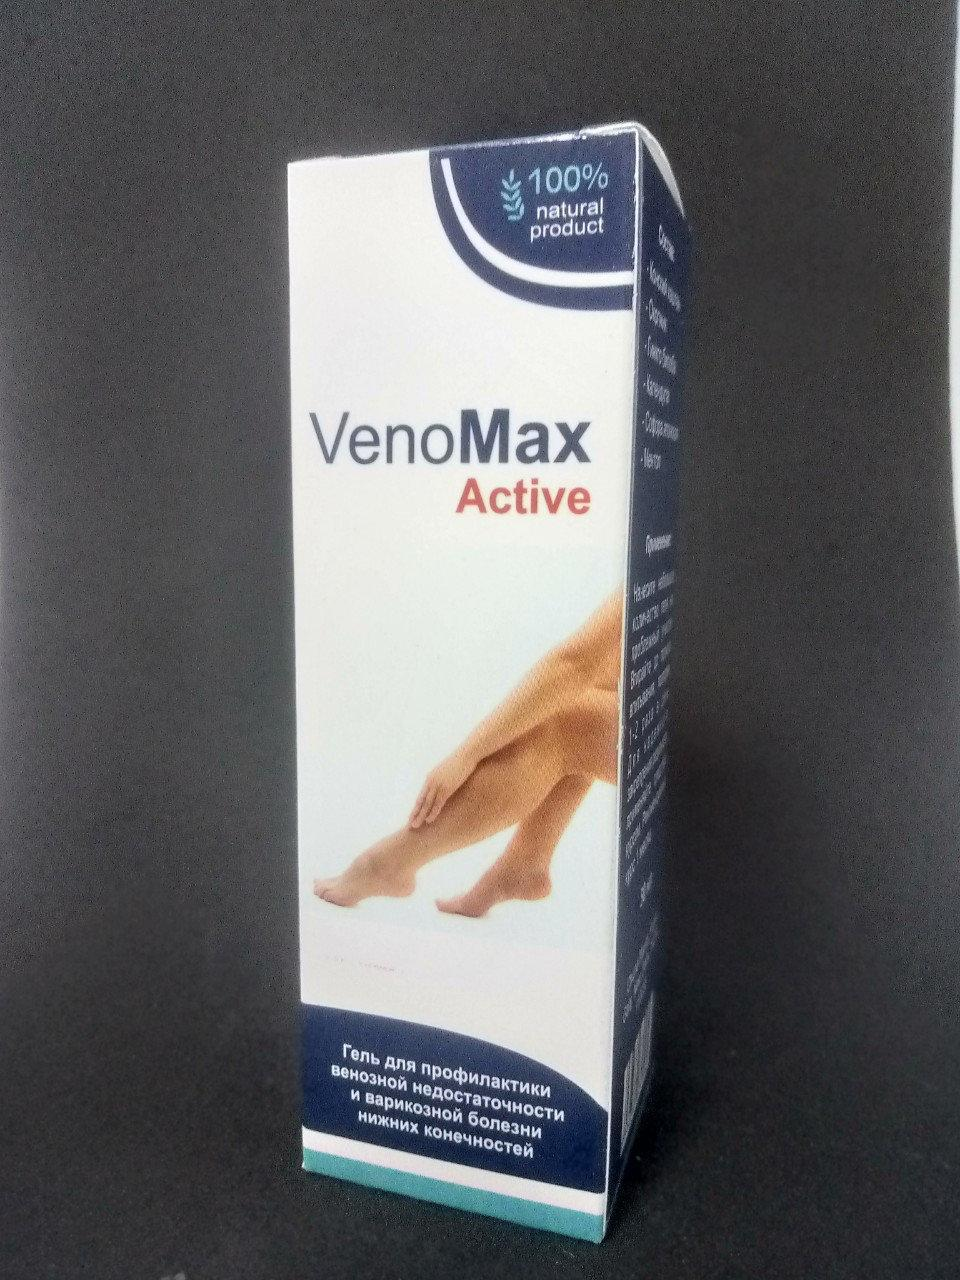 💊💊VenoMax Active – Гель от варикоза (ВеноМакс Актив) | Украина VenoMax Active, Киев VenoMax Active, Гель от варикоза, Вено макс Актив